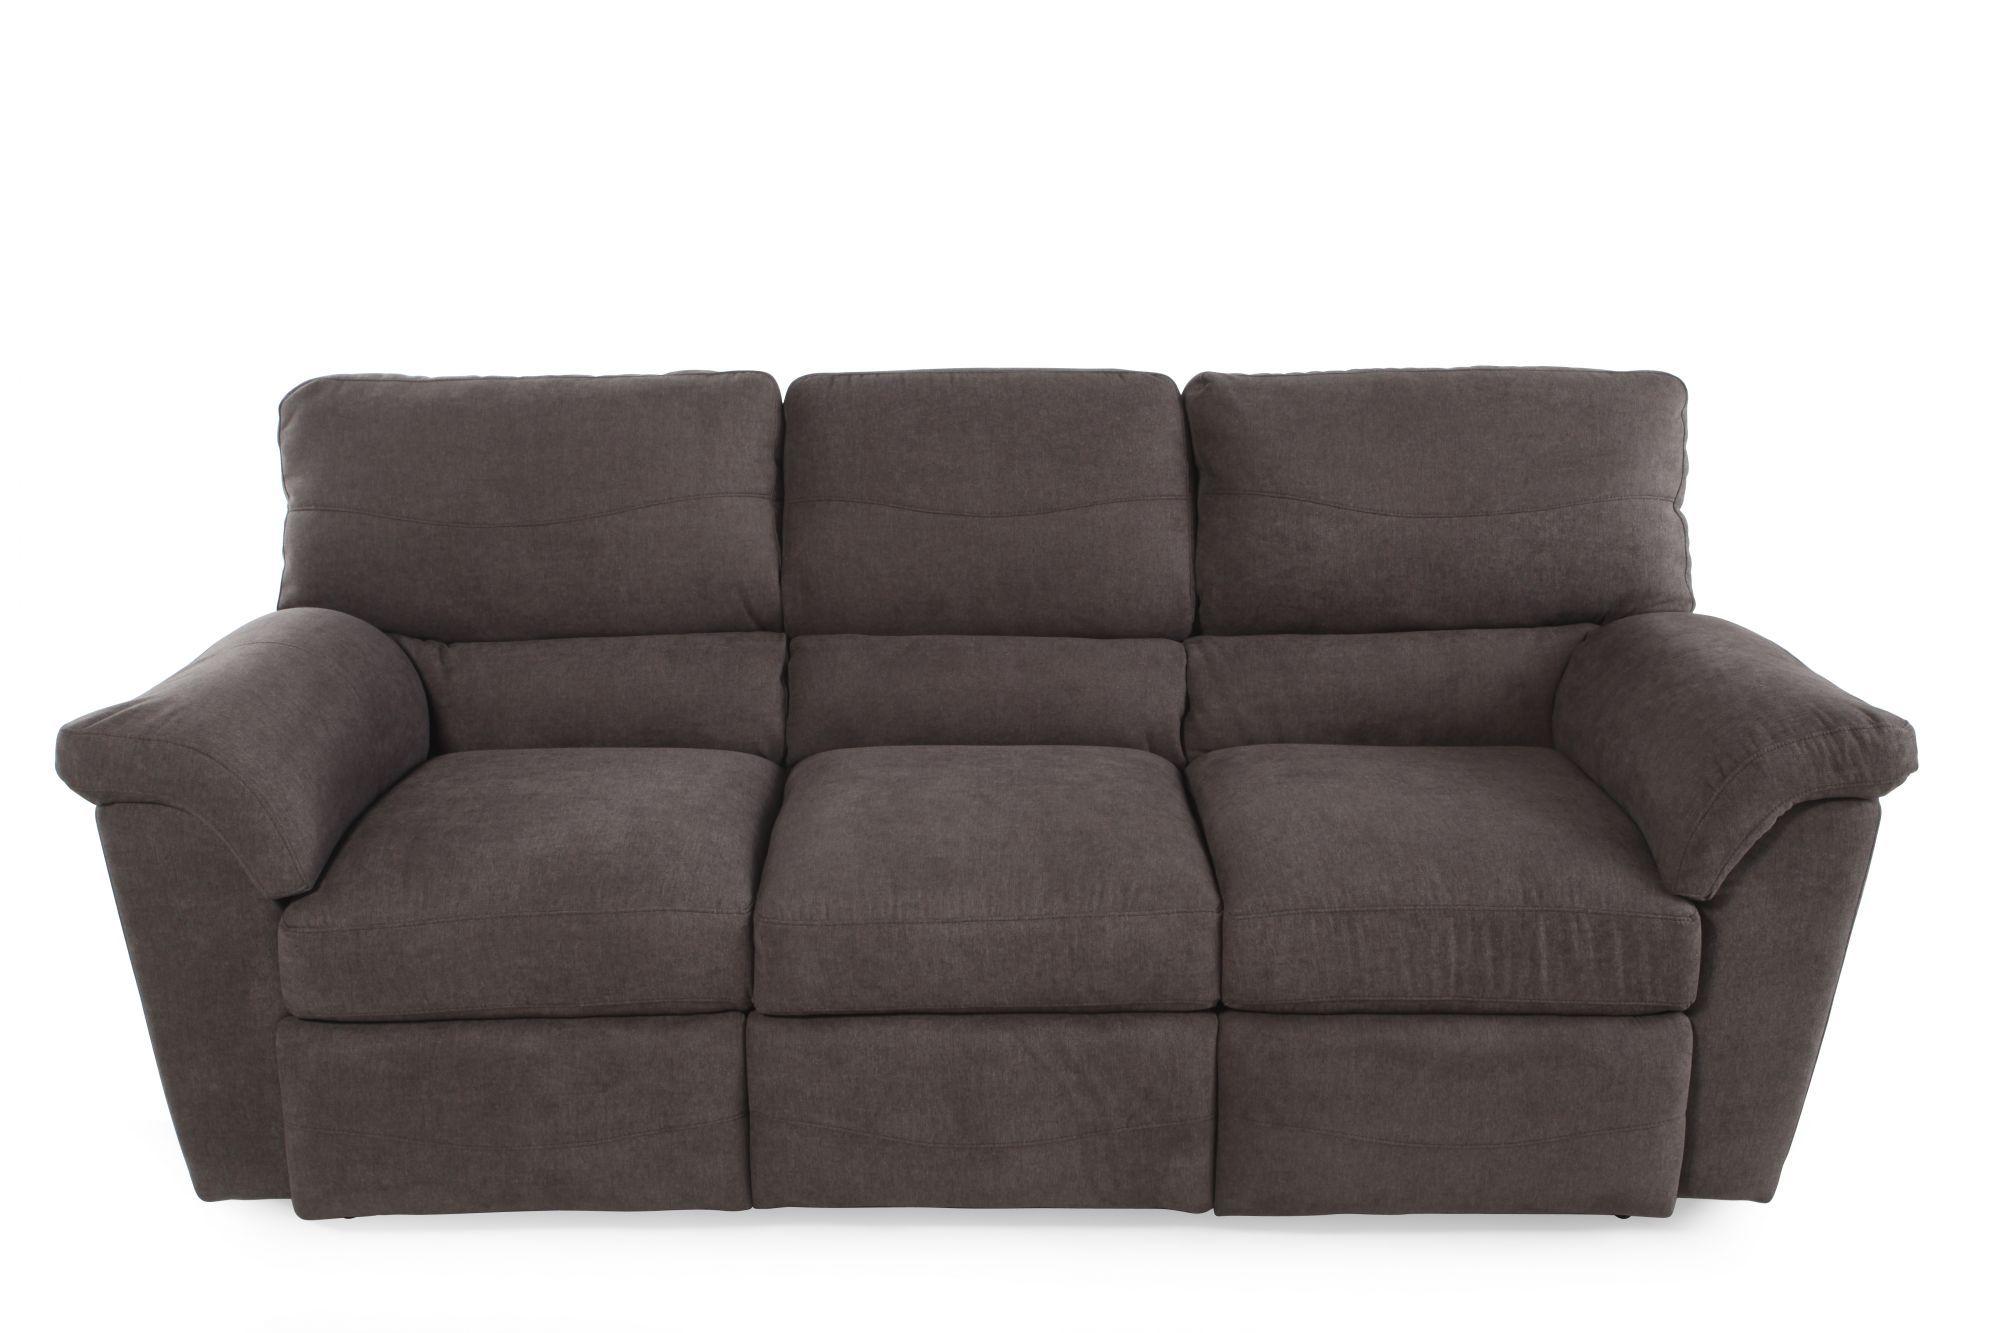 La Z Boy Reese Granite Reclining Sofa Mathis Brothers Furniture